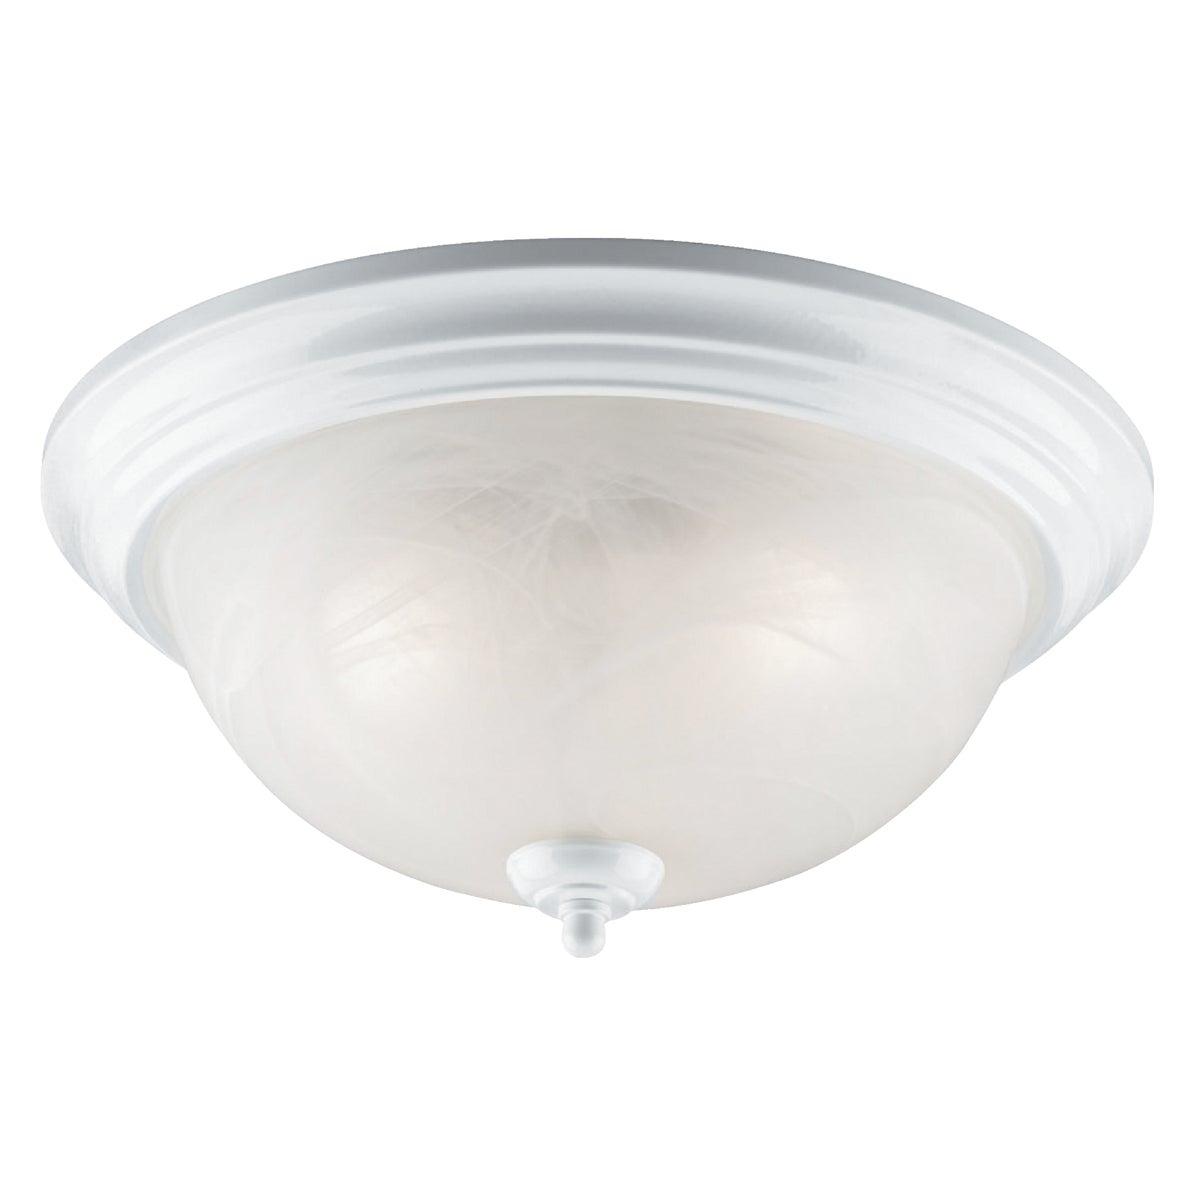 Westinghouse Lighting WHT CEILING FIXTURE 64358